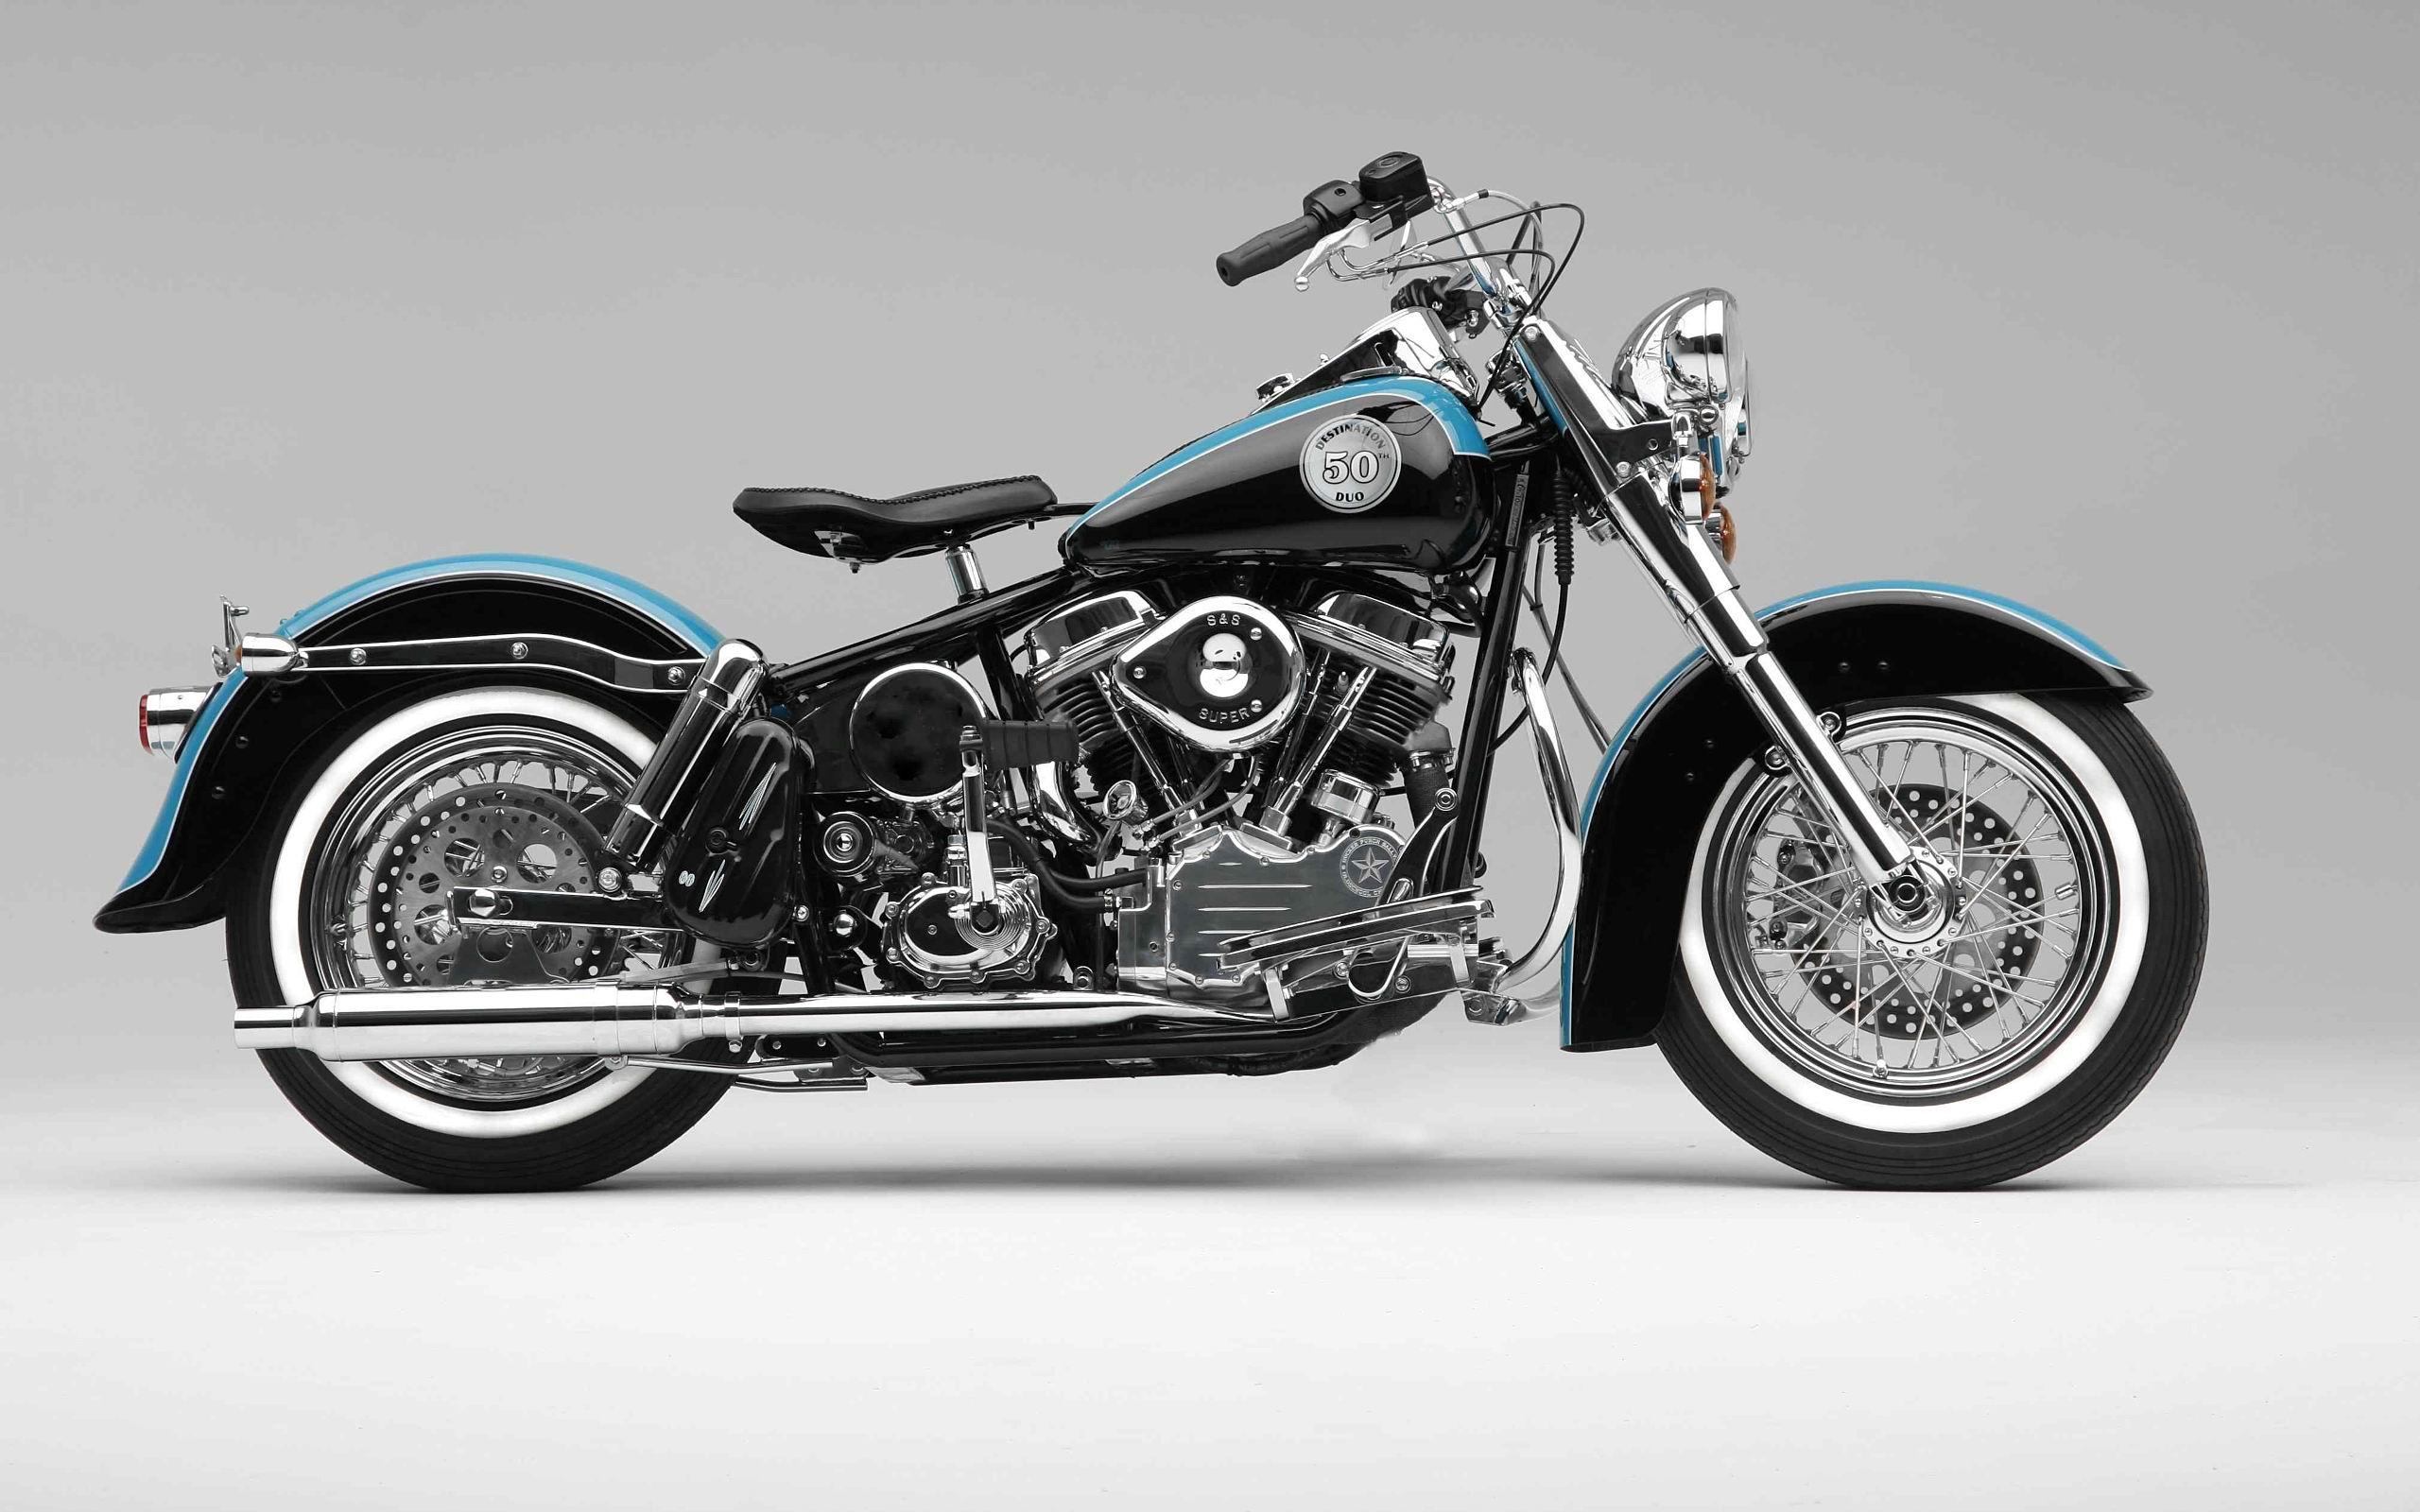 Motorcycle Harley Davidson Image 22679 Wallpaper High 2560x1600